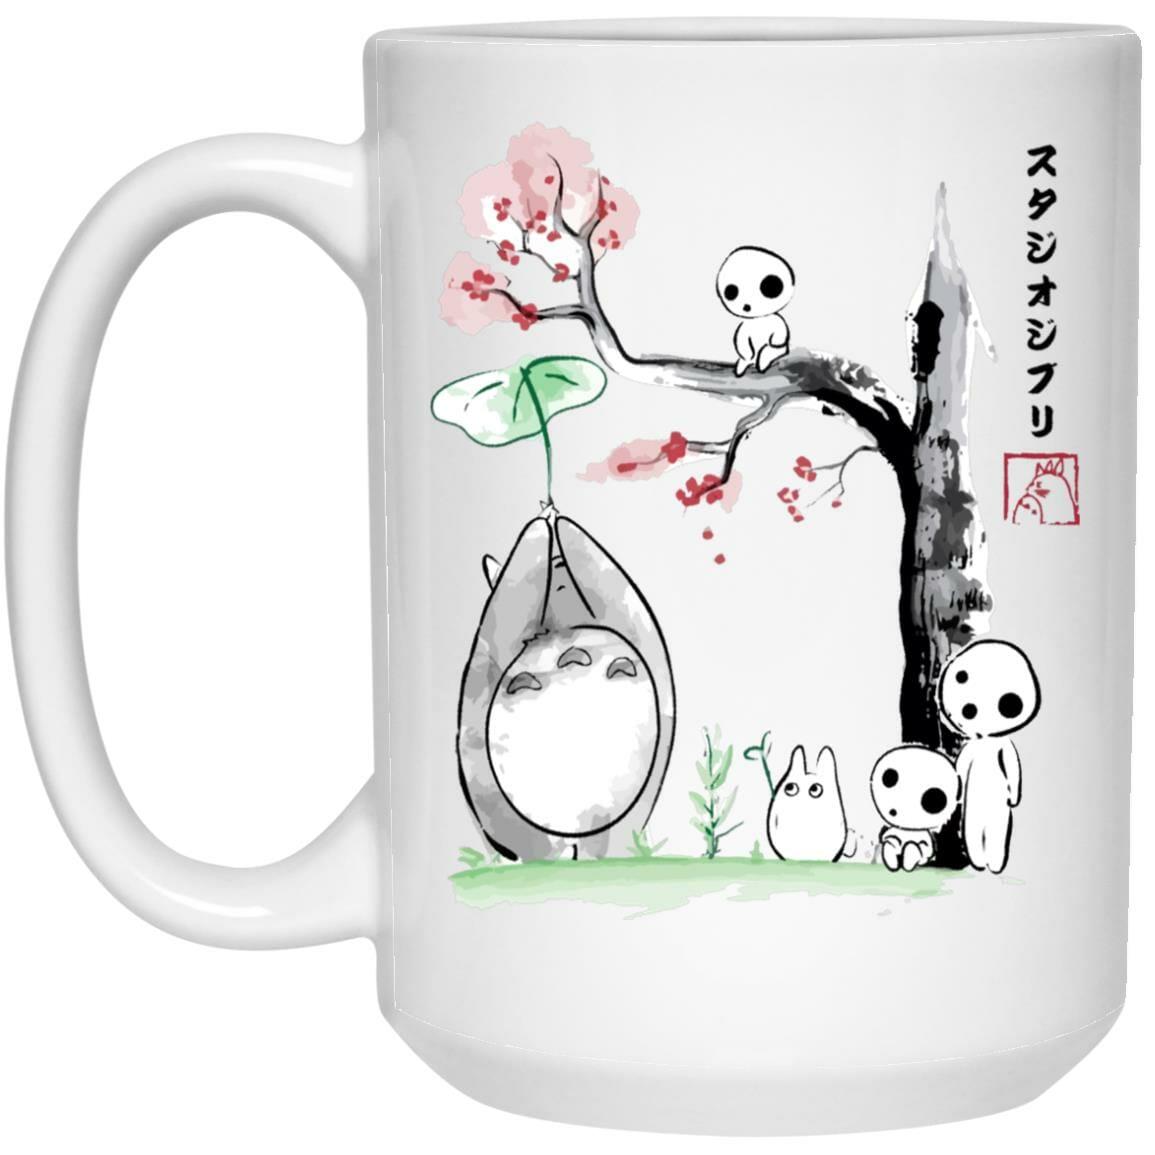 Totoro and the Tree Spirits Mug